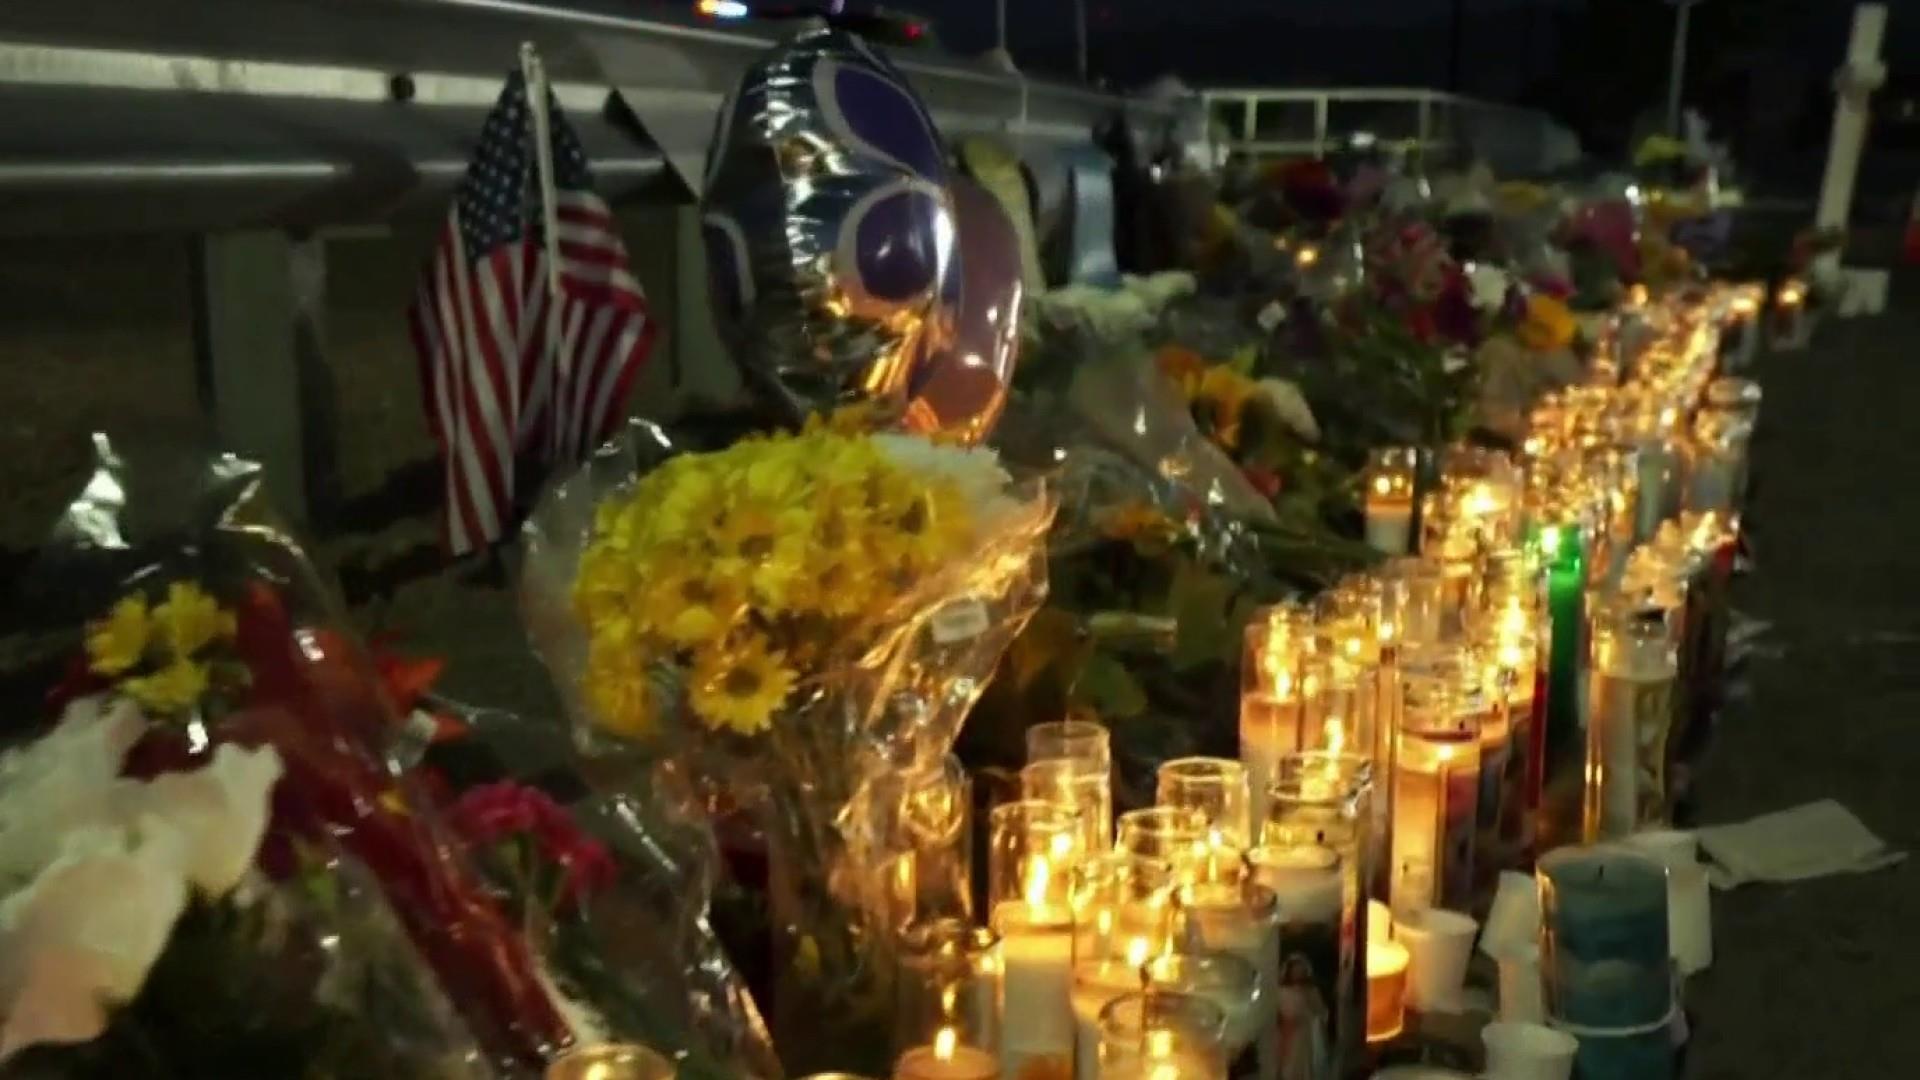 Charlottesville anniversary opportune for Trump to make amends